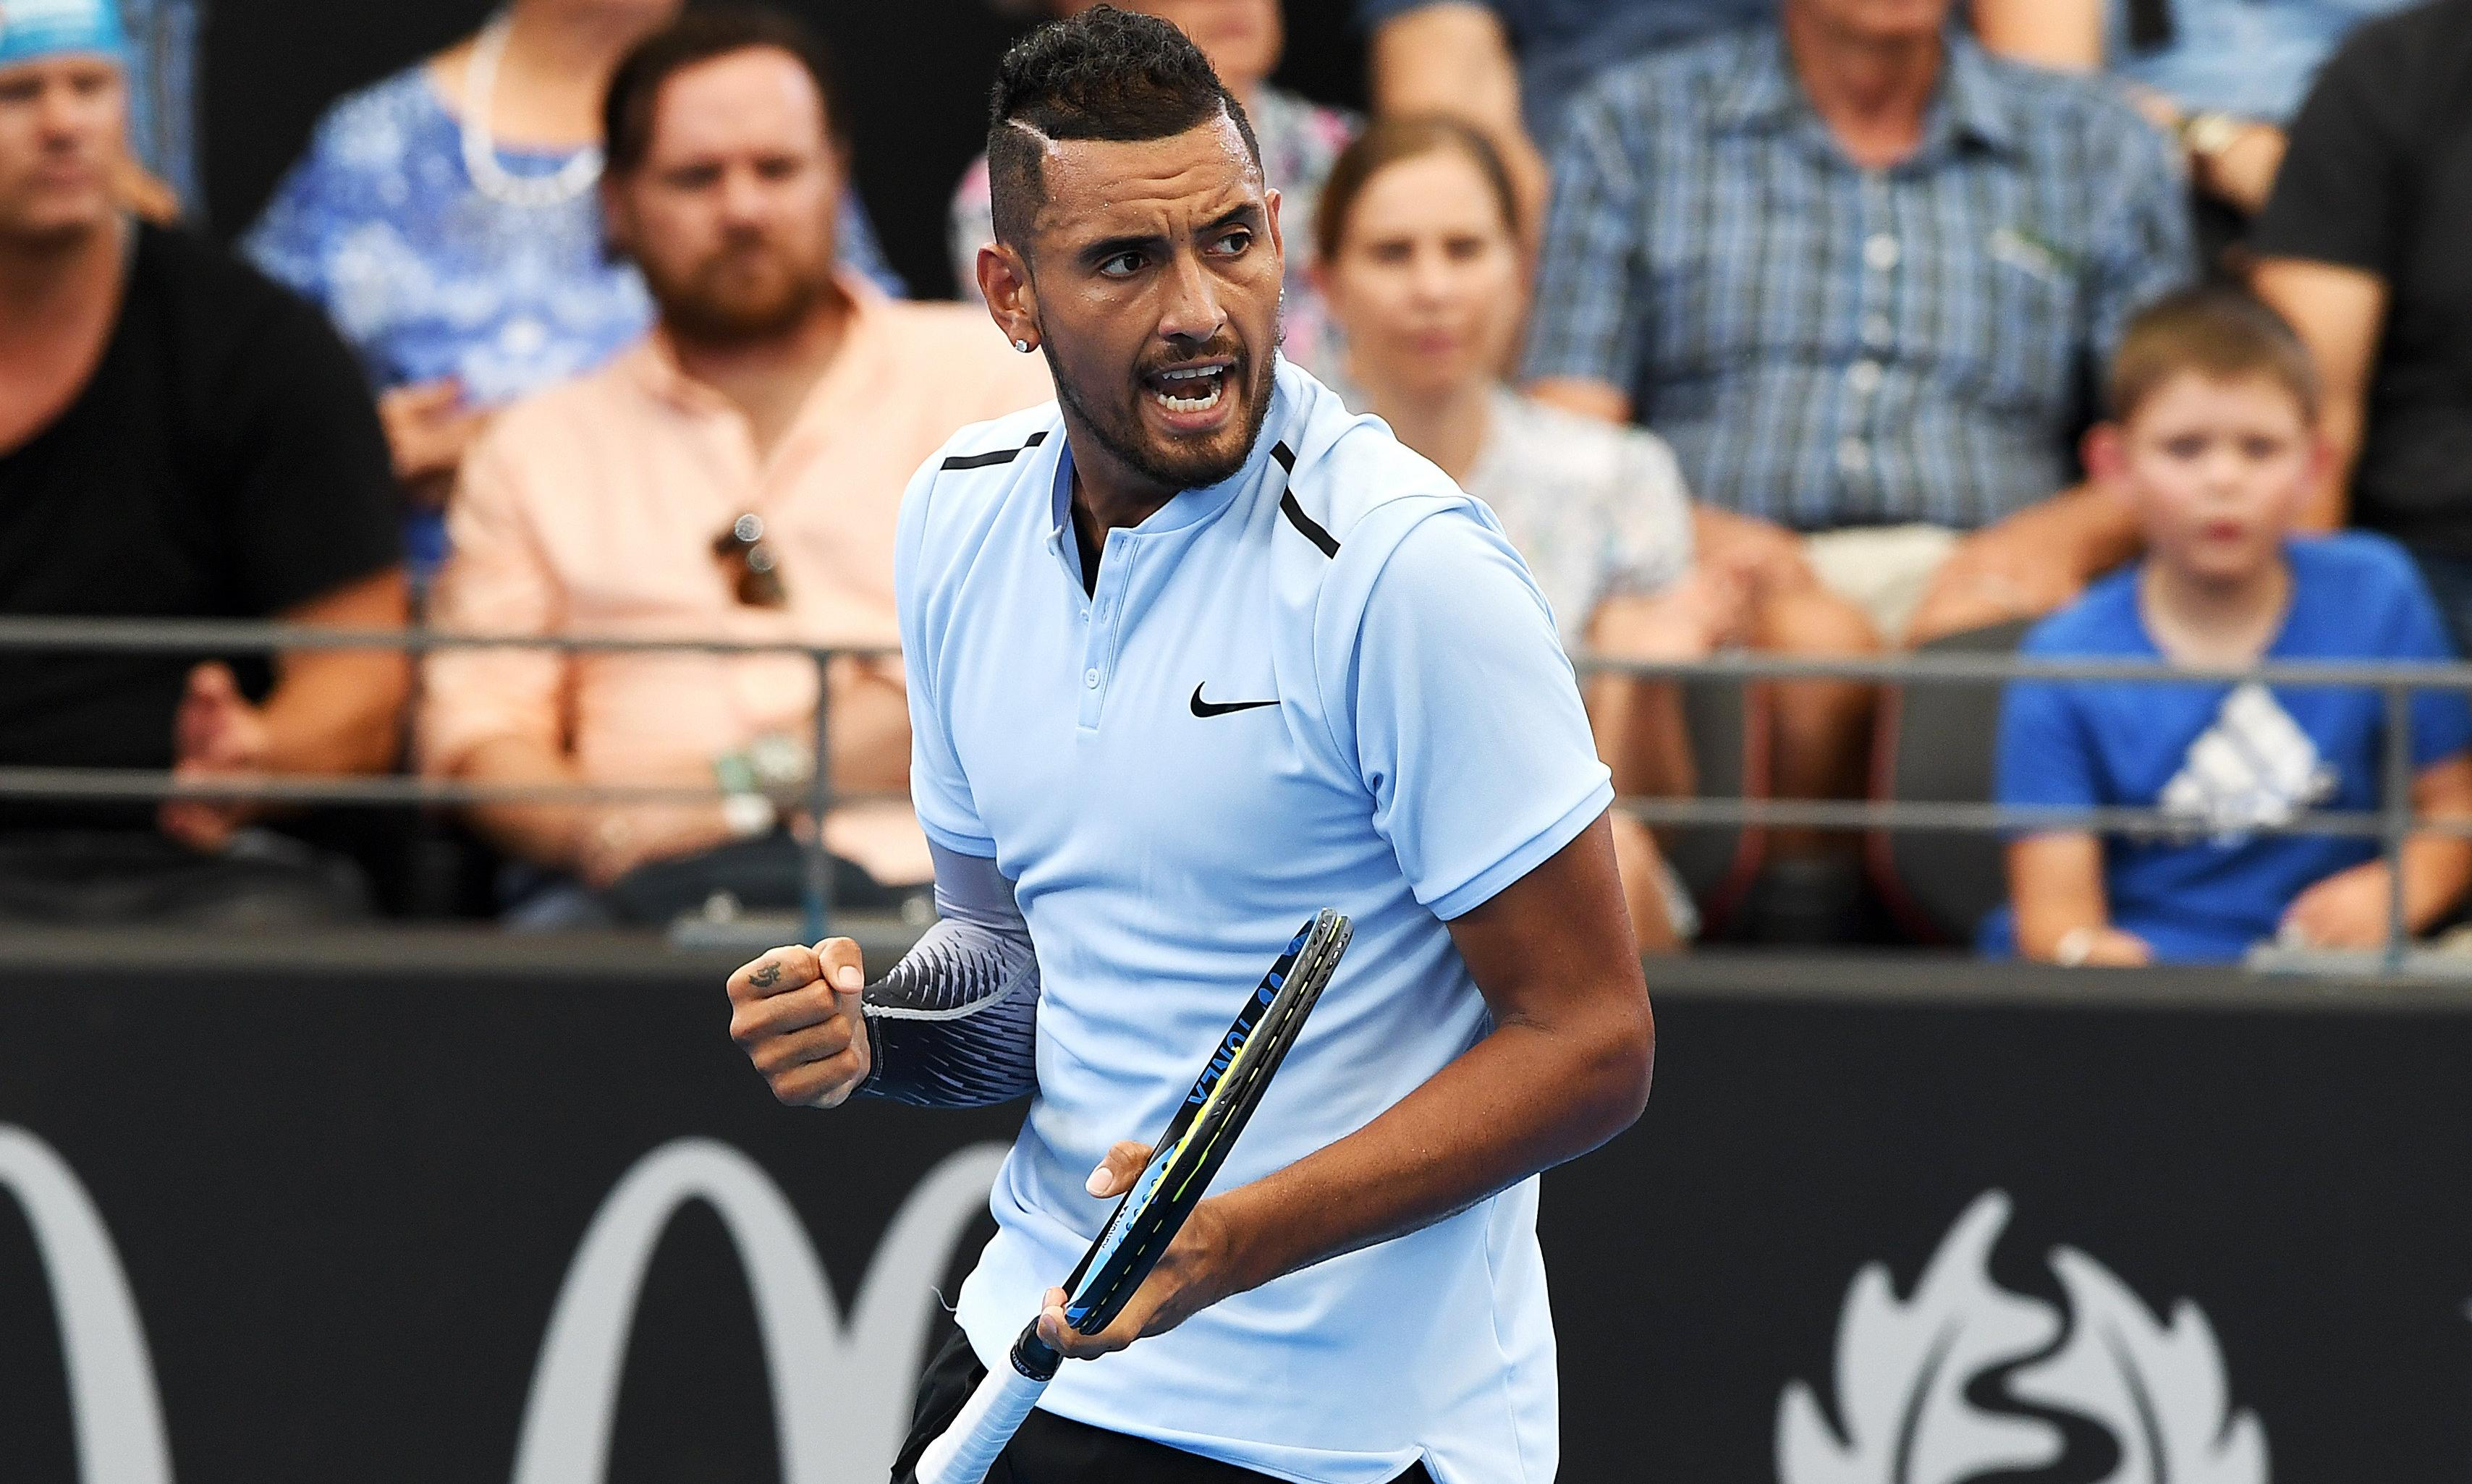 Tennis: Nick Kyrgios through to Brisbane semi-finals